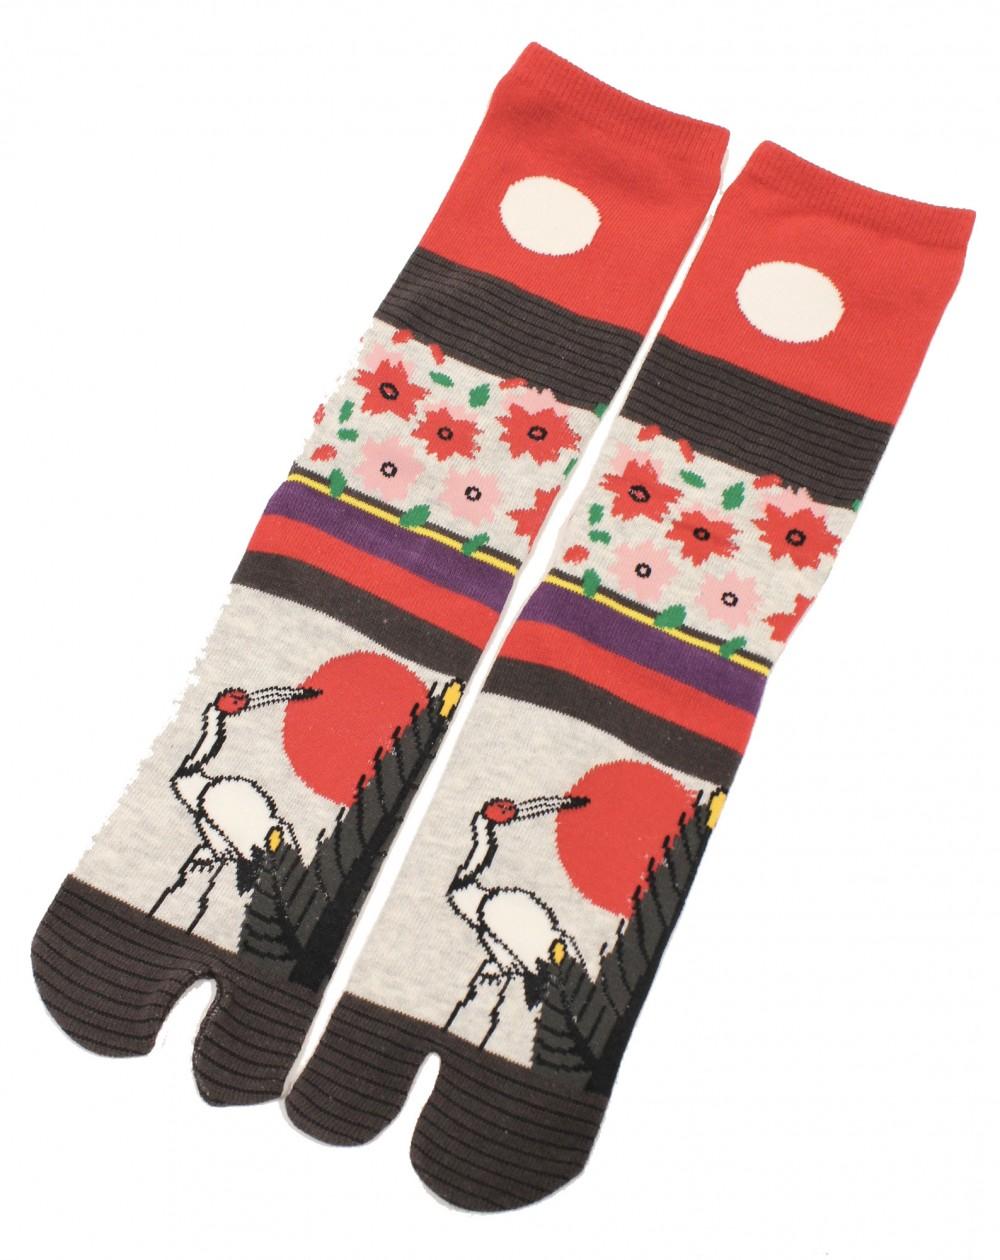 TABI hight socks Hanafuda